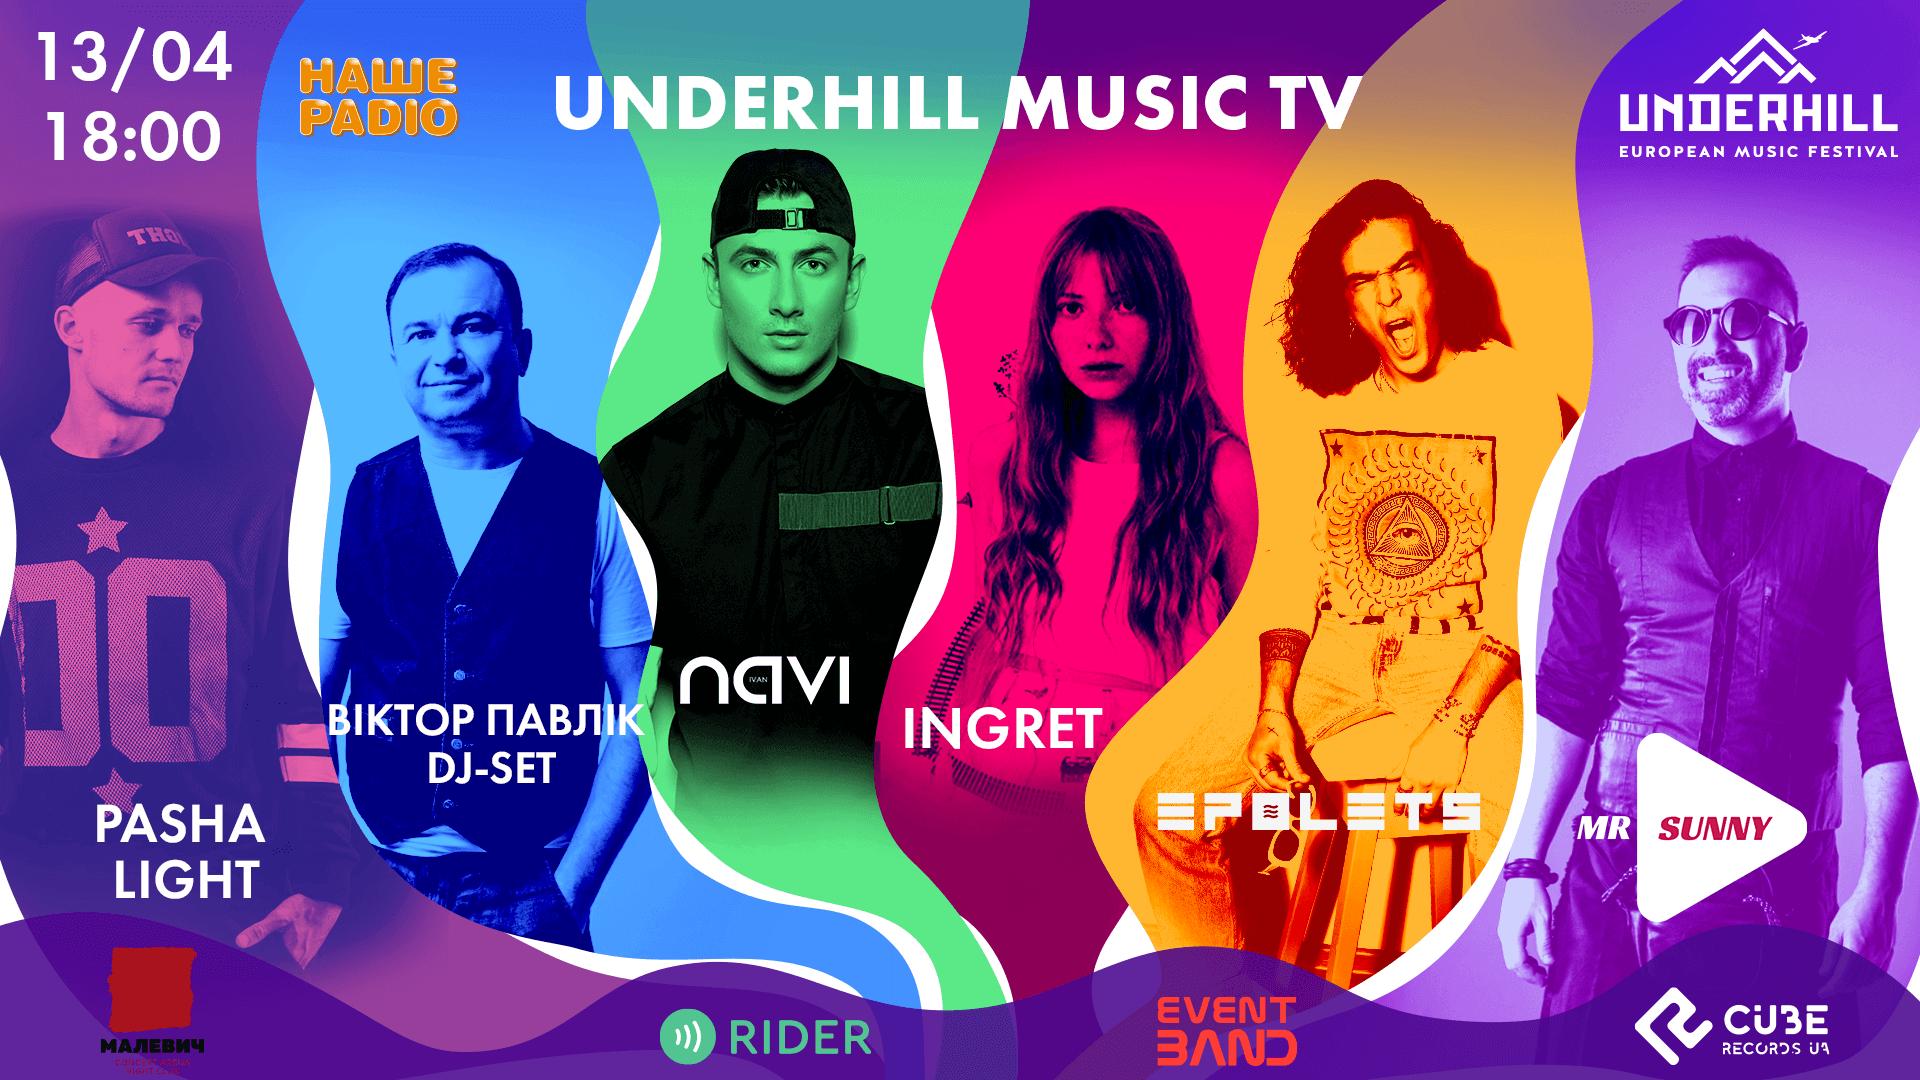 UNDERHILL MUSIC TV влаштує наймасштабніший онлайн-фестиваль (ПРОГРАМА)